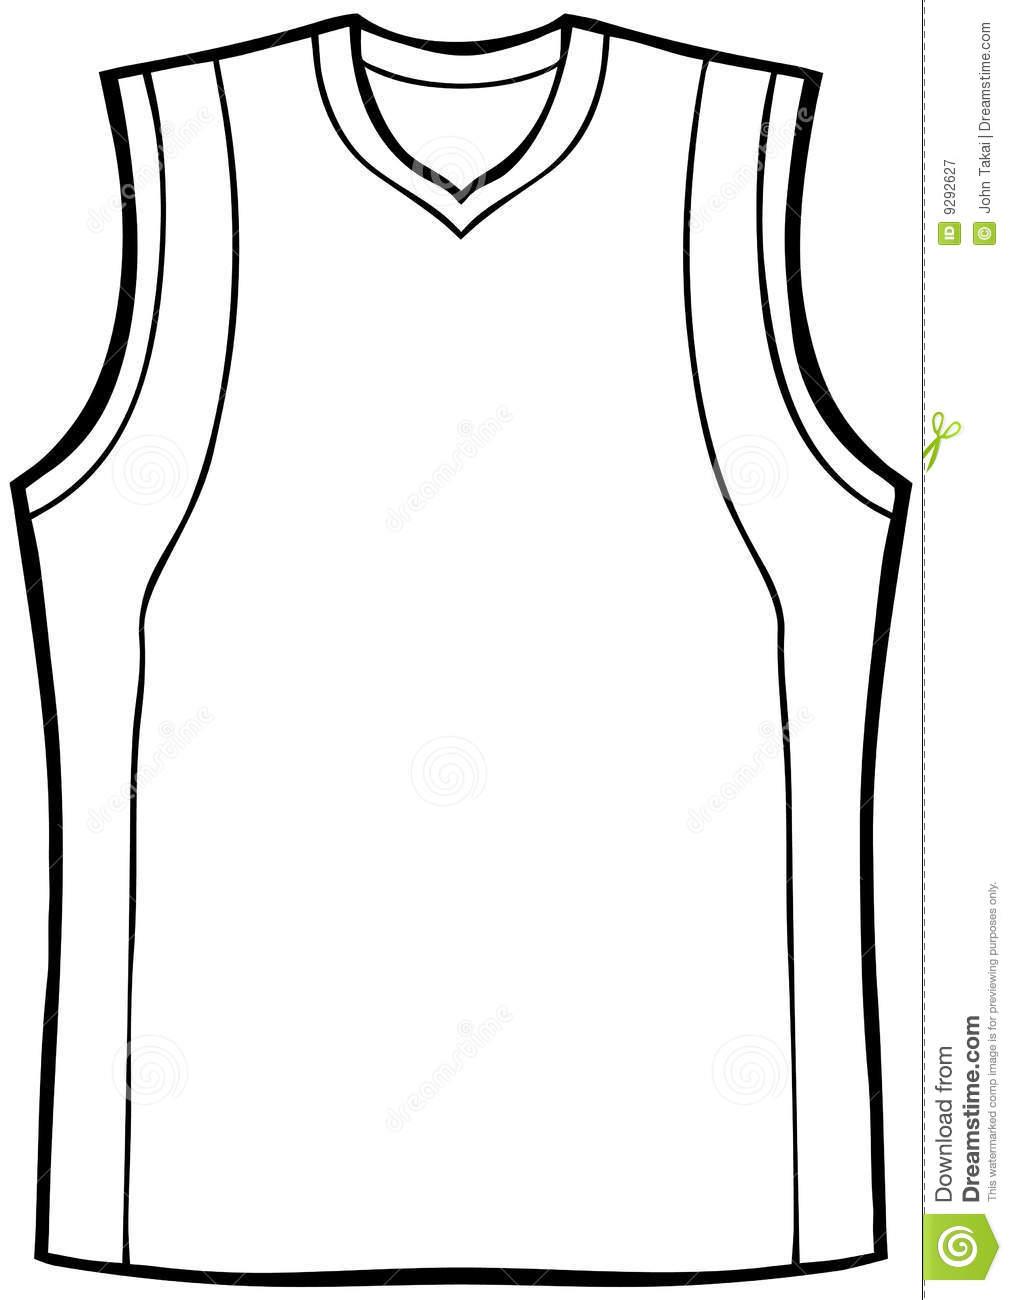 Best Classic Jersey Designs